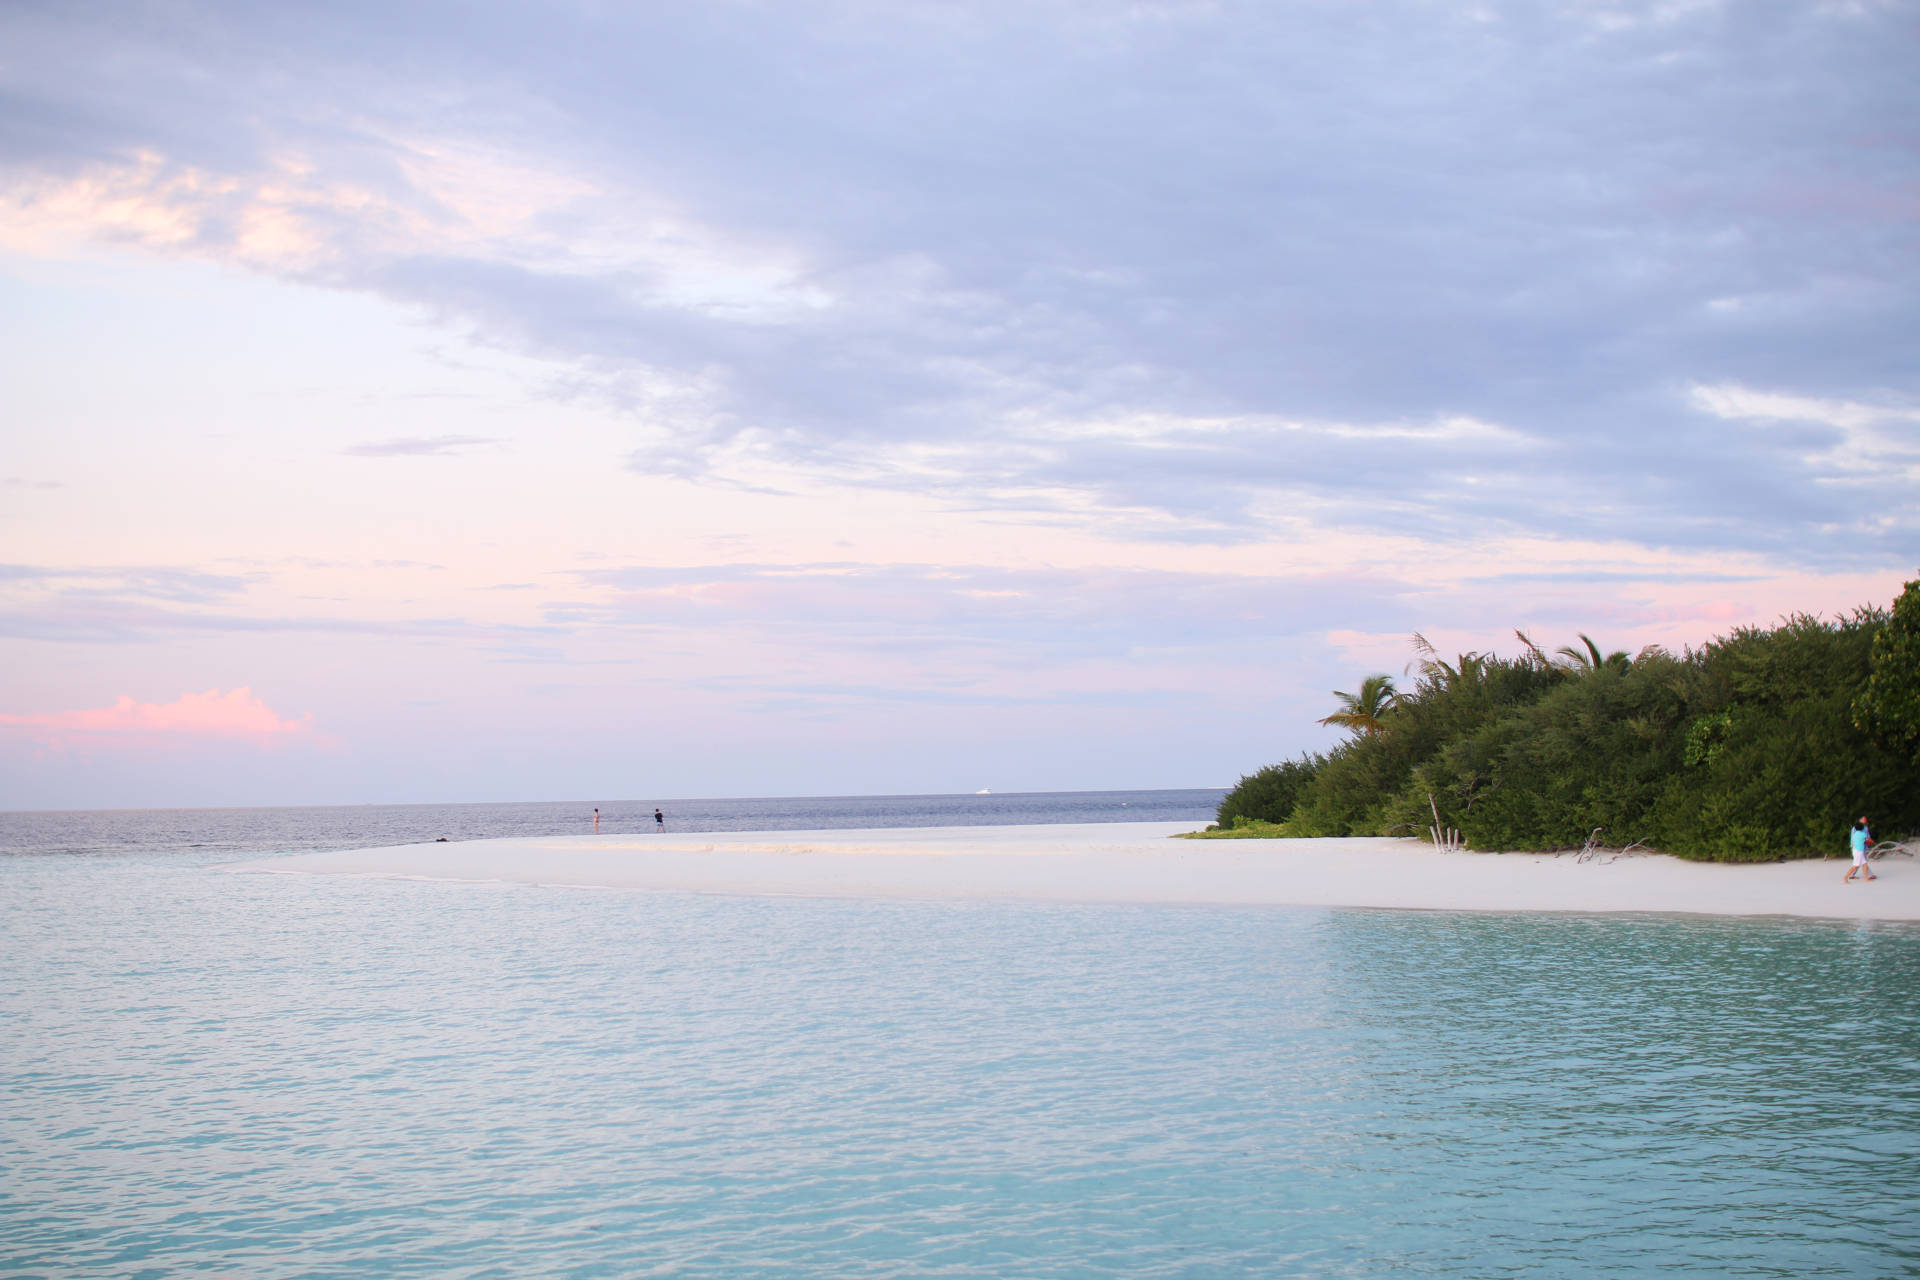 kihavah maldives